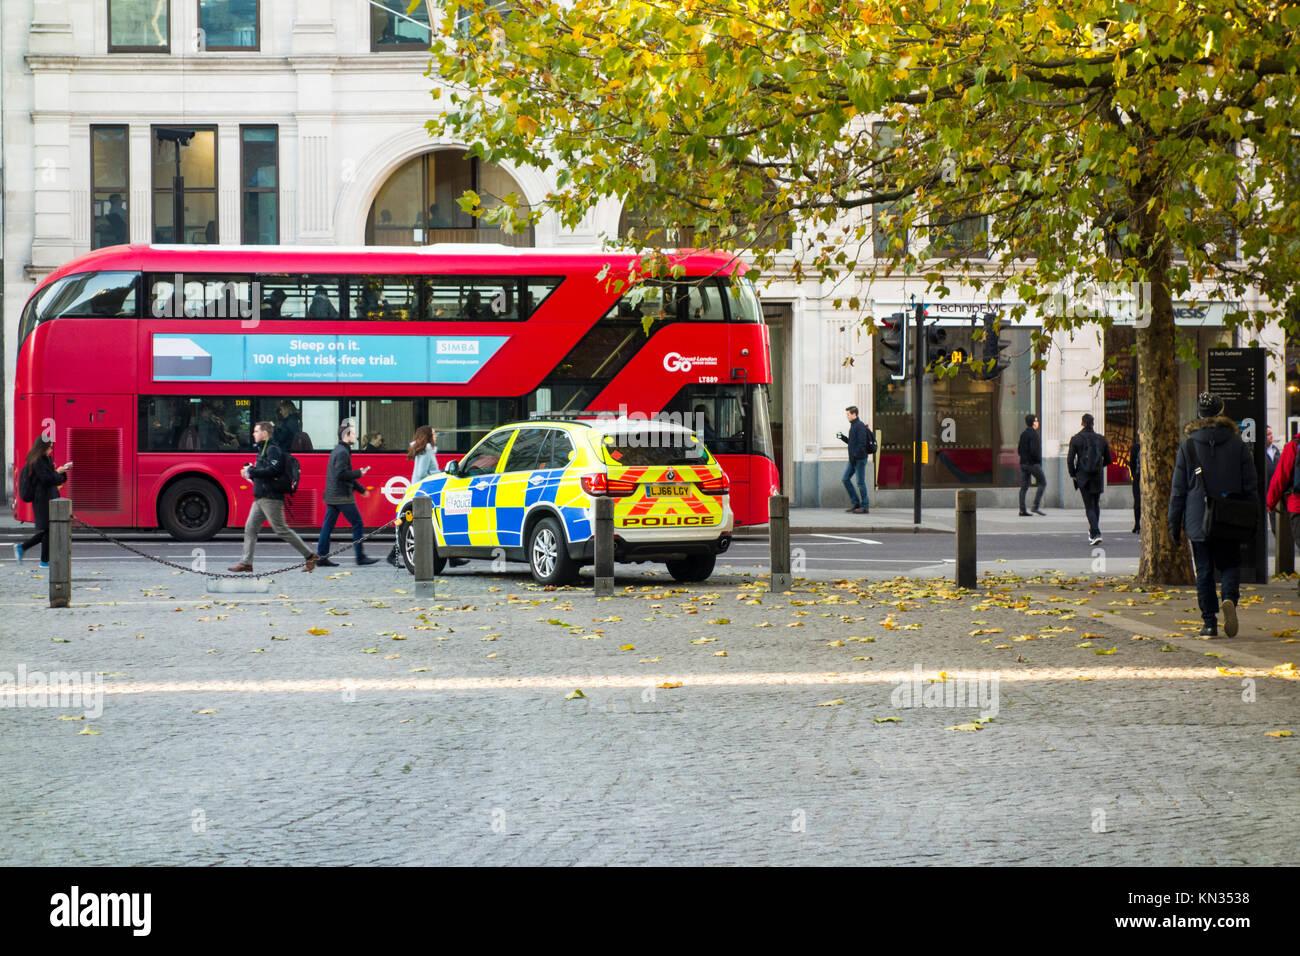 Stadt London Polizei Fahrzeug in St. Paul Kirchhof, London, UK geparkt Stockbild